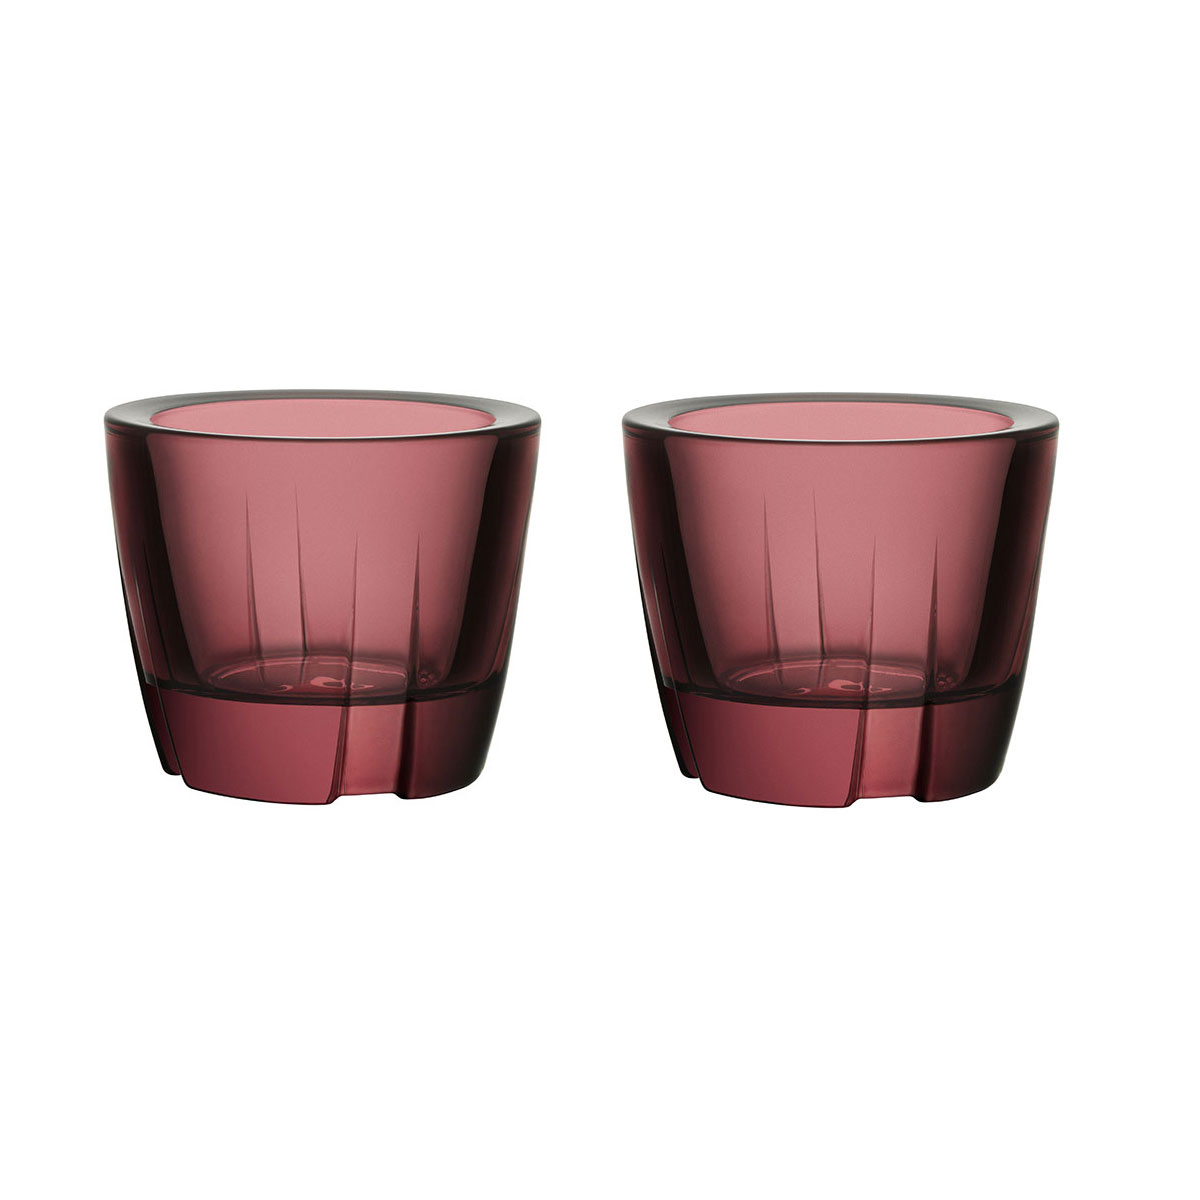 Kosta Boda Bruk Crystal Votive Aubergine Purple Anything Crystal Bowl, Pair